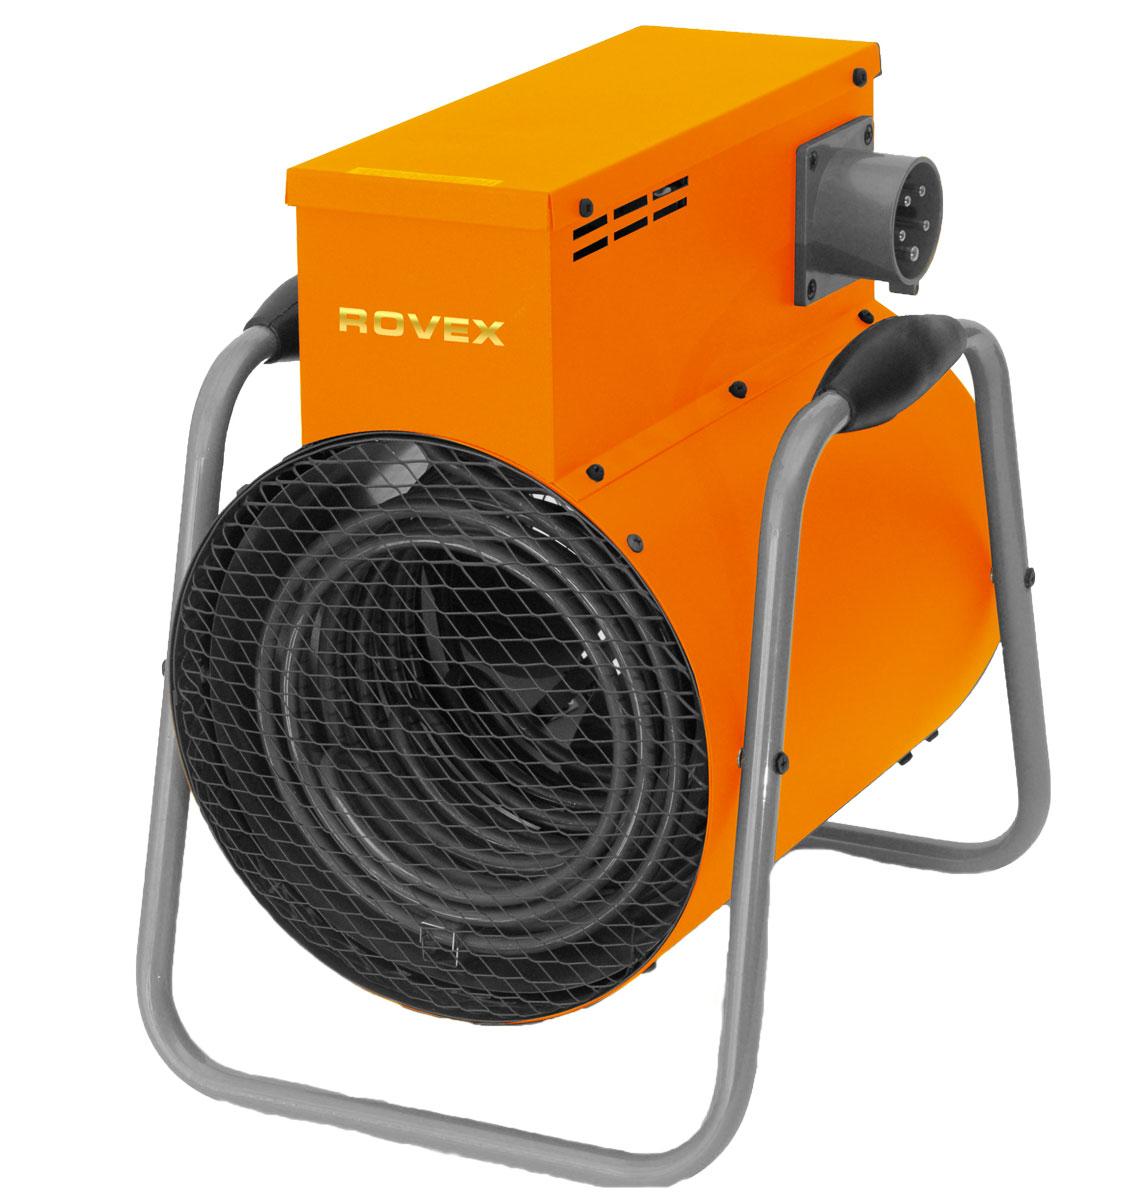 Rovex RT-09К тепловая пушка - Обогреватели